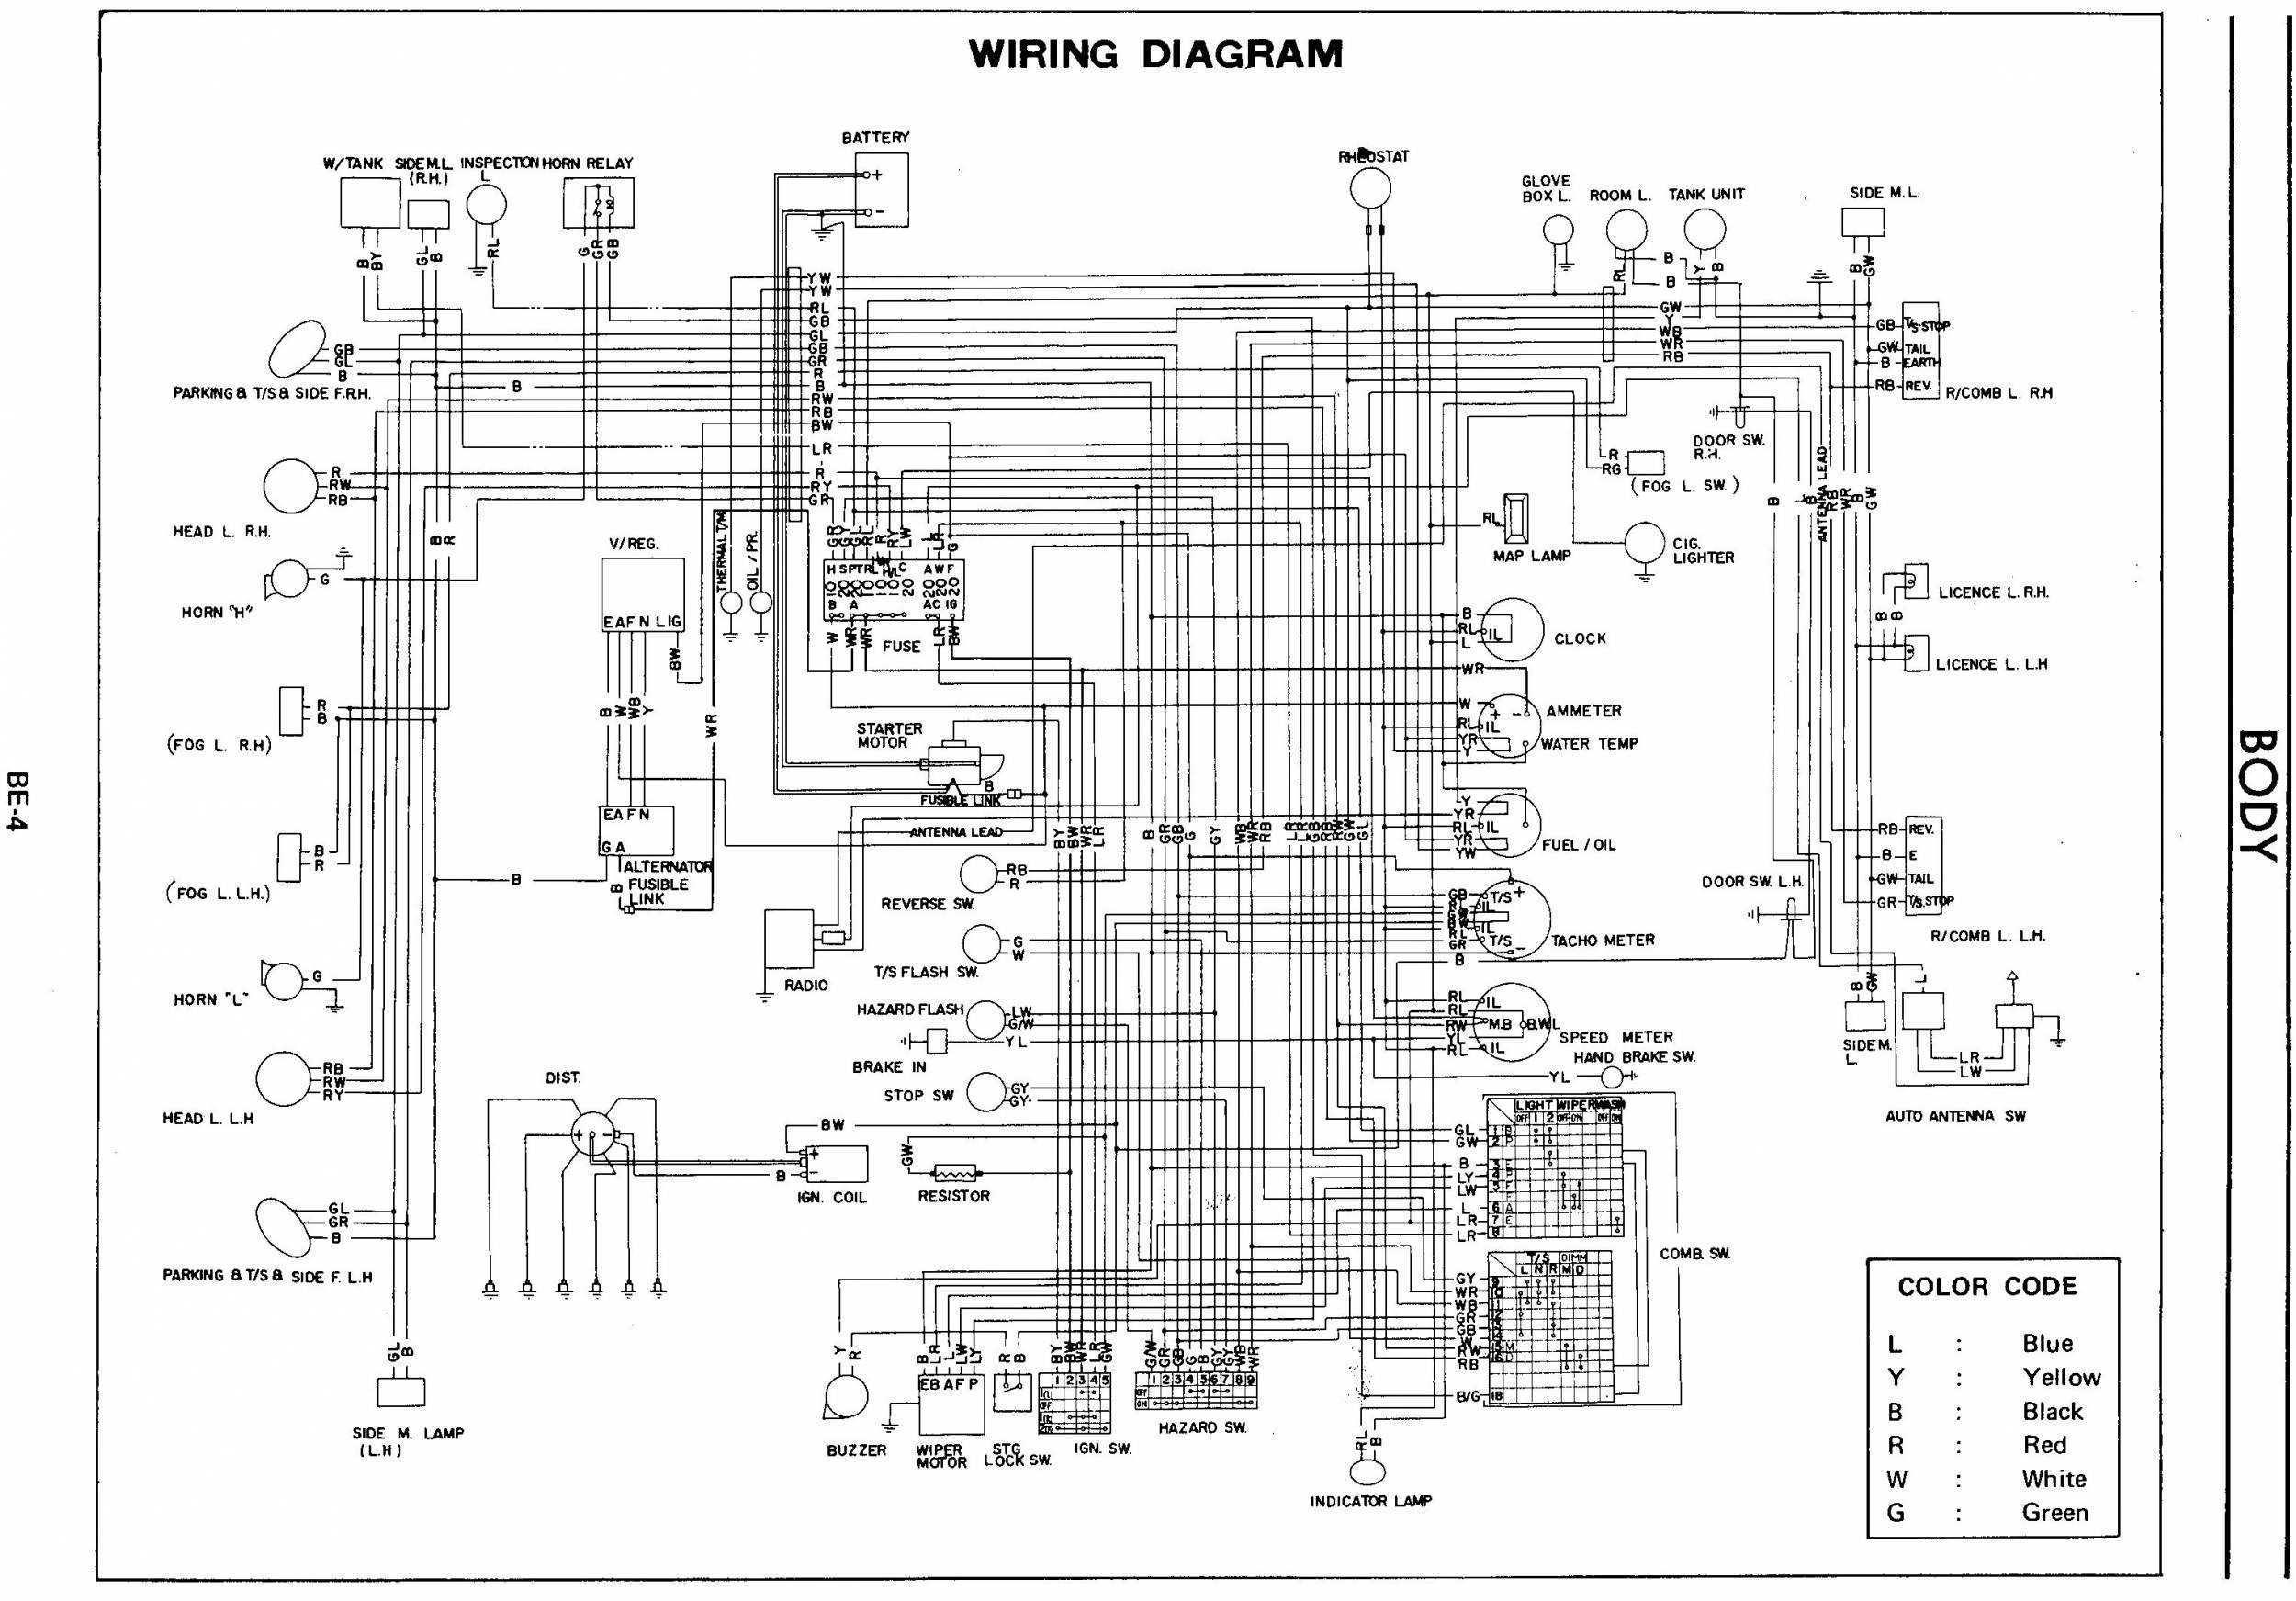 sprinter rv electrical diagram